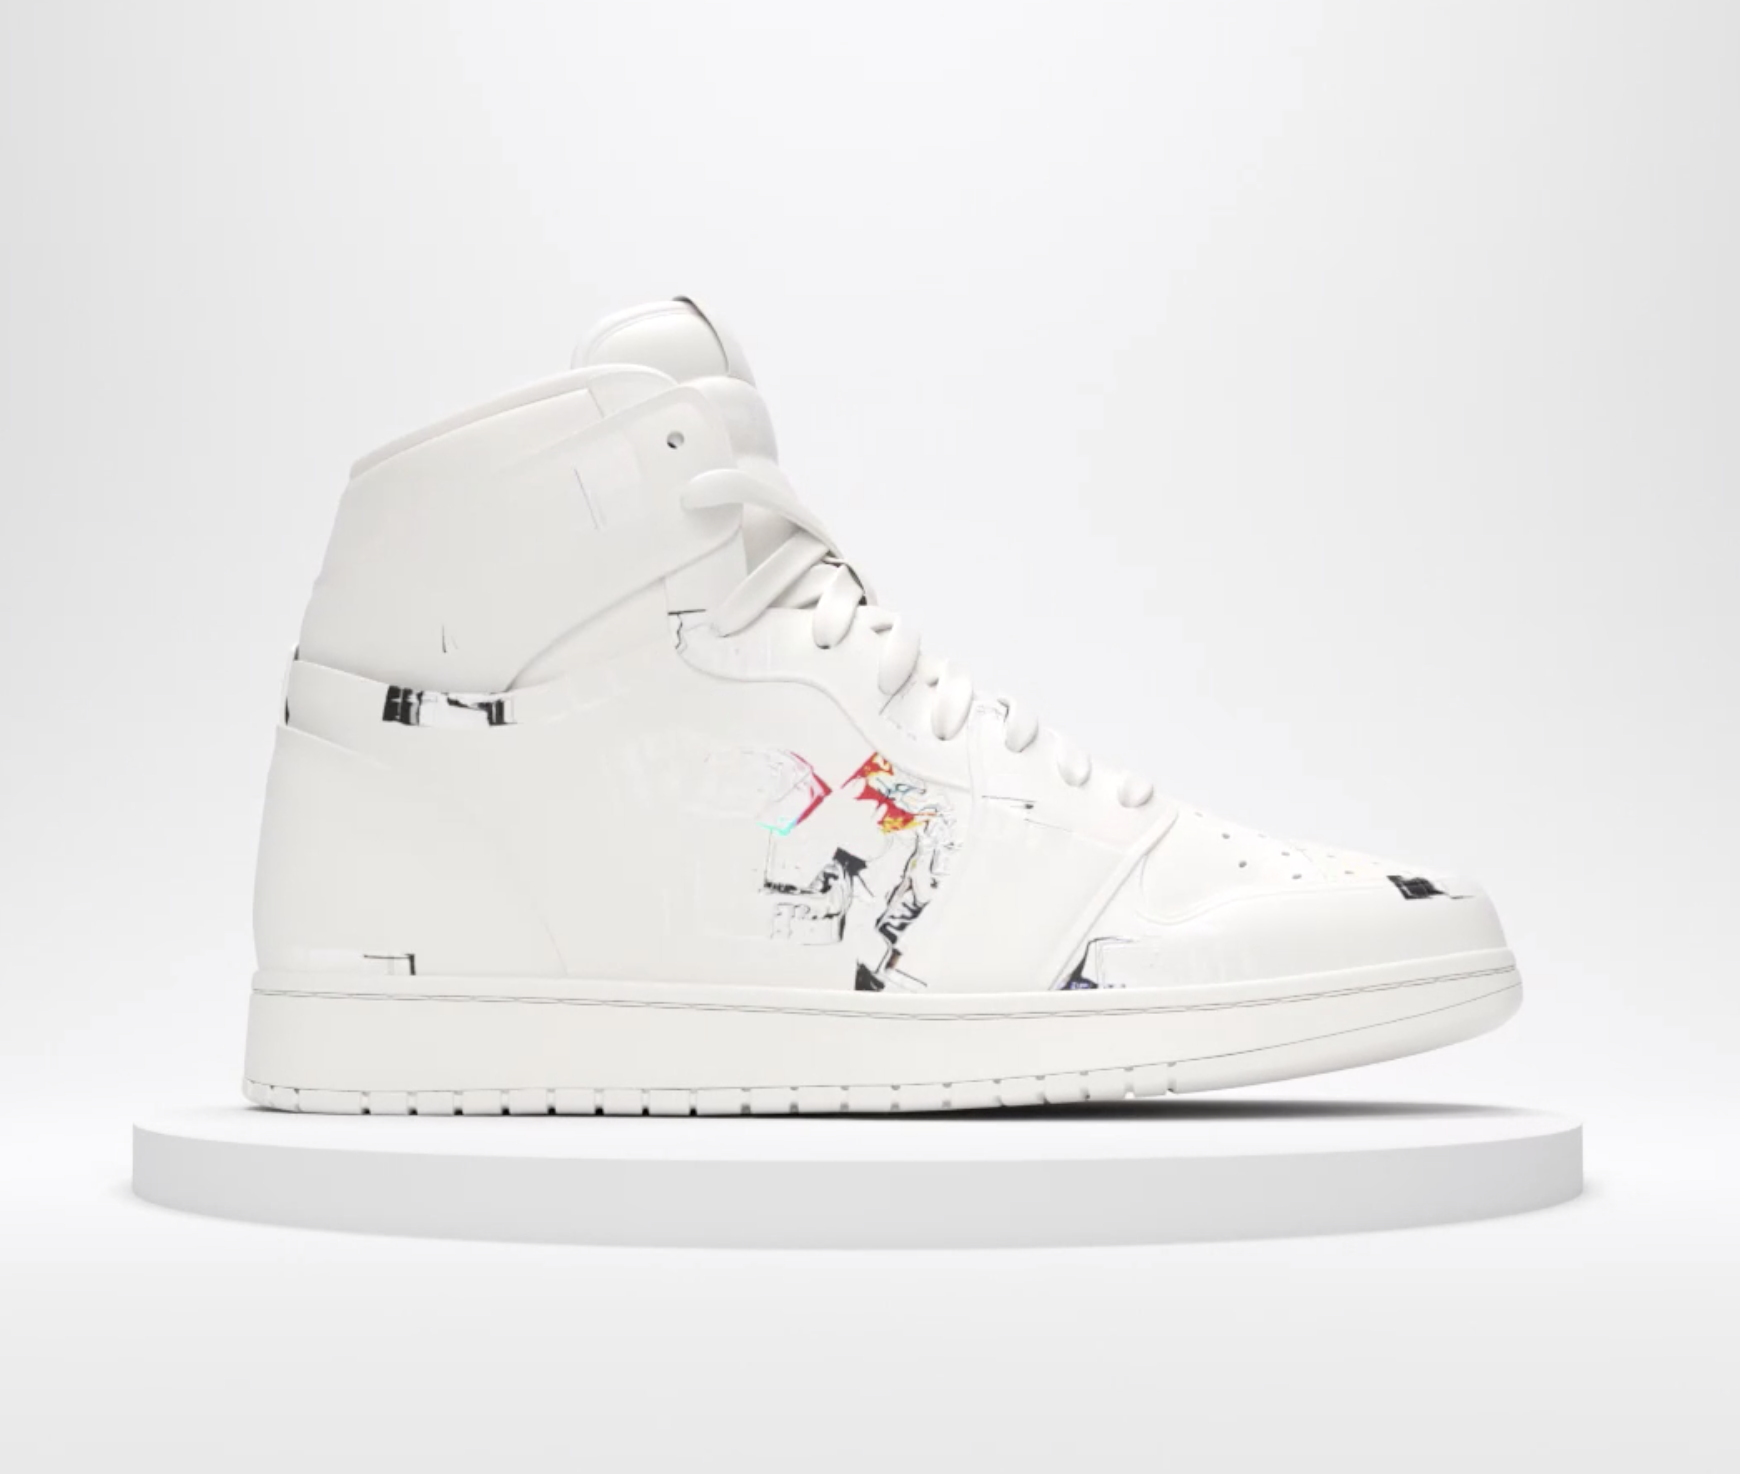 Digital Sneaker